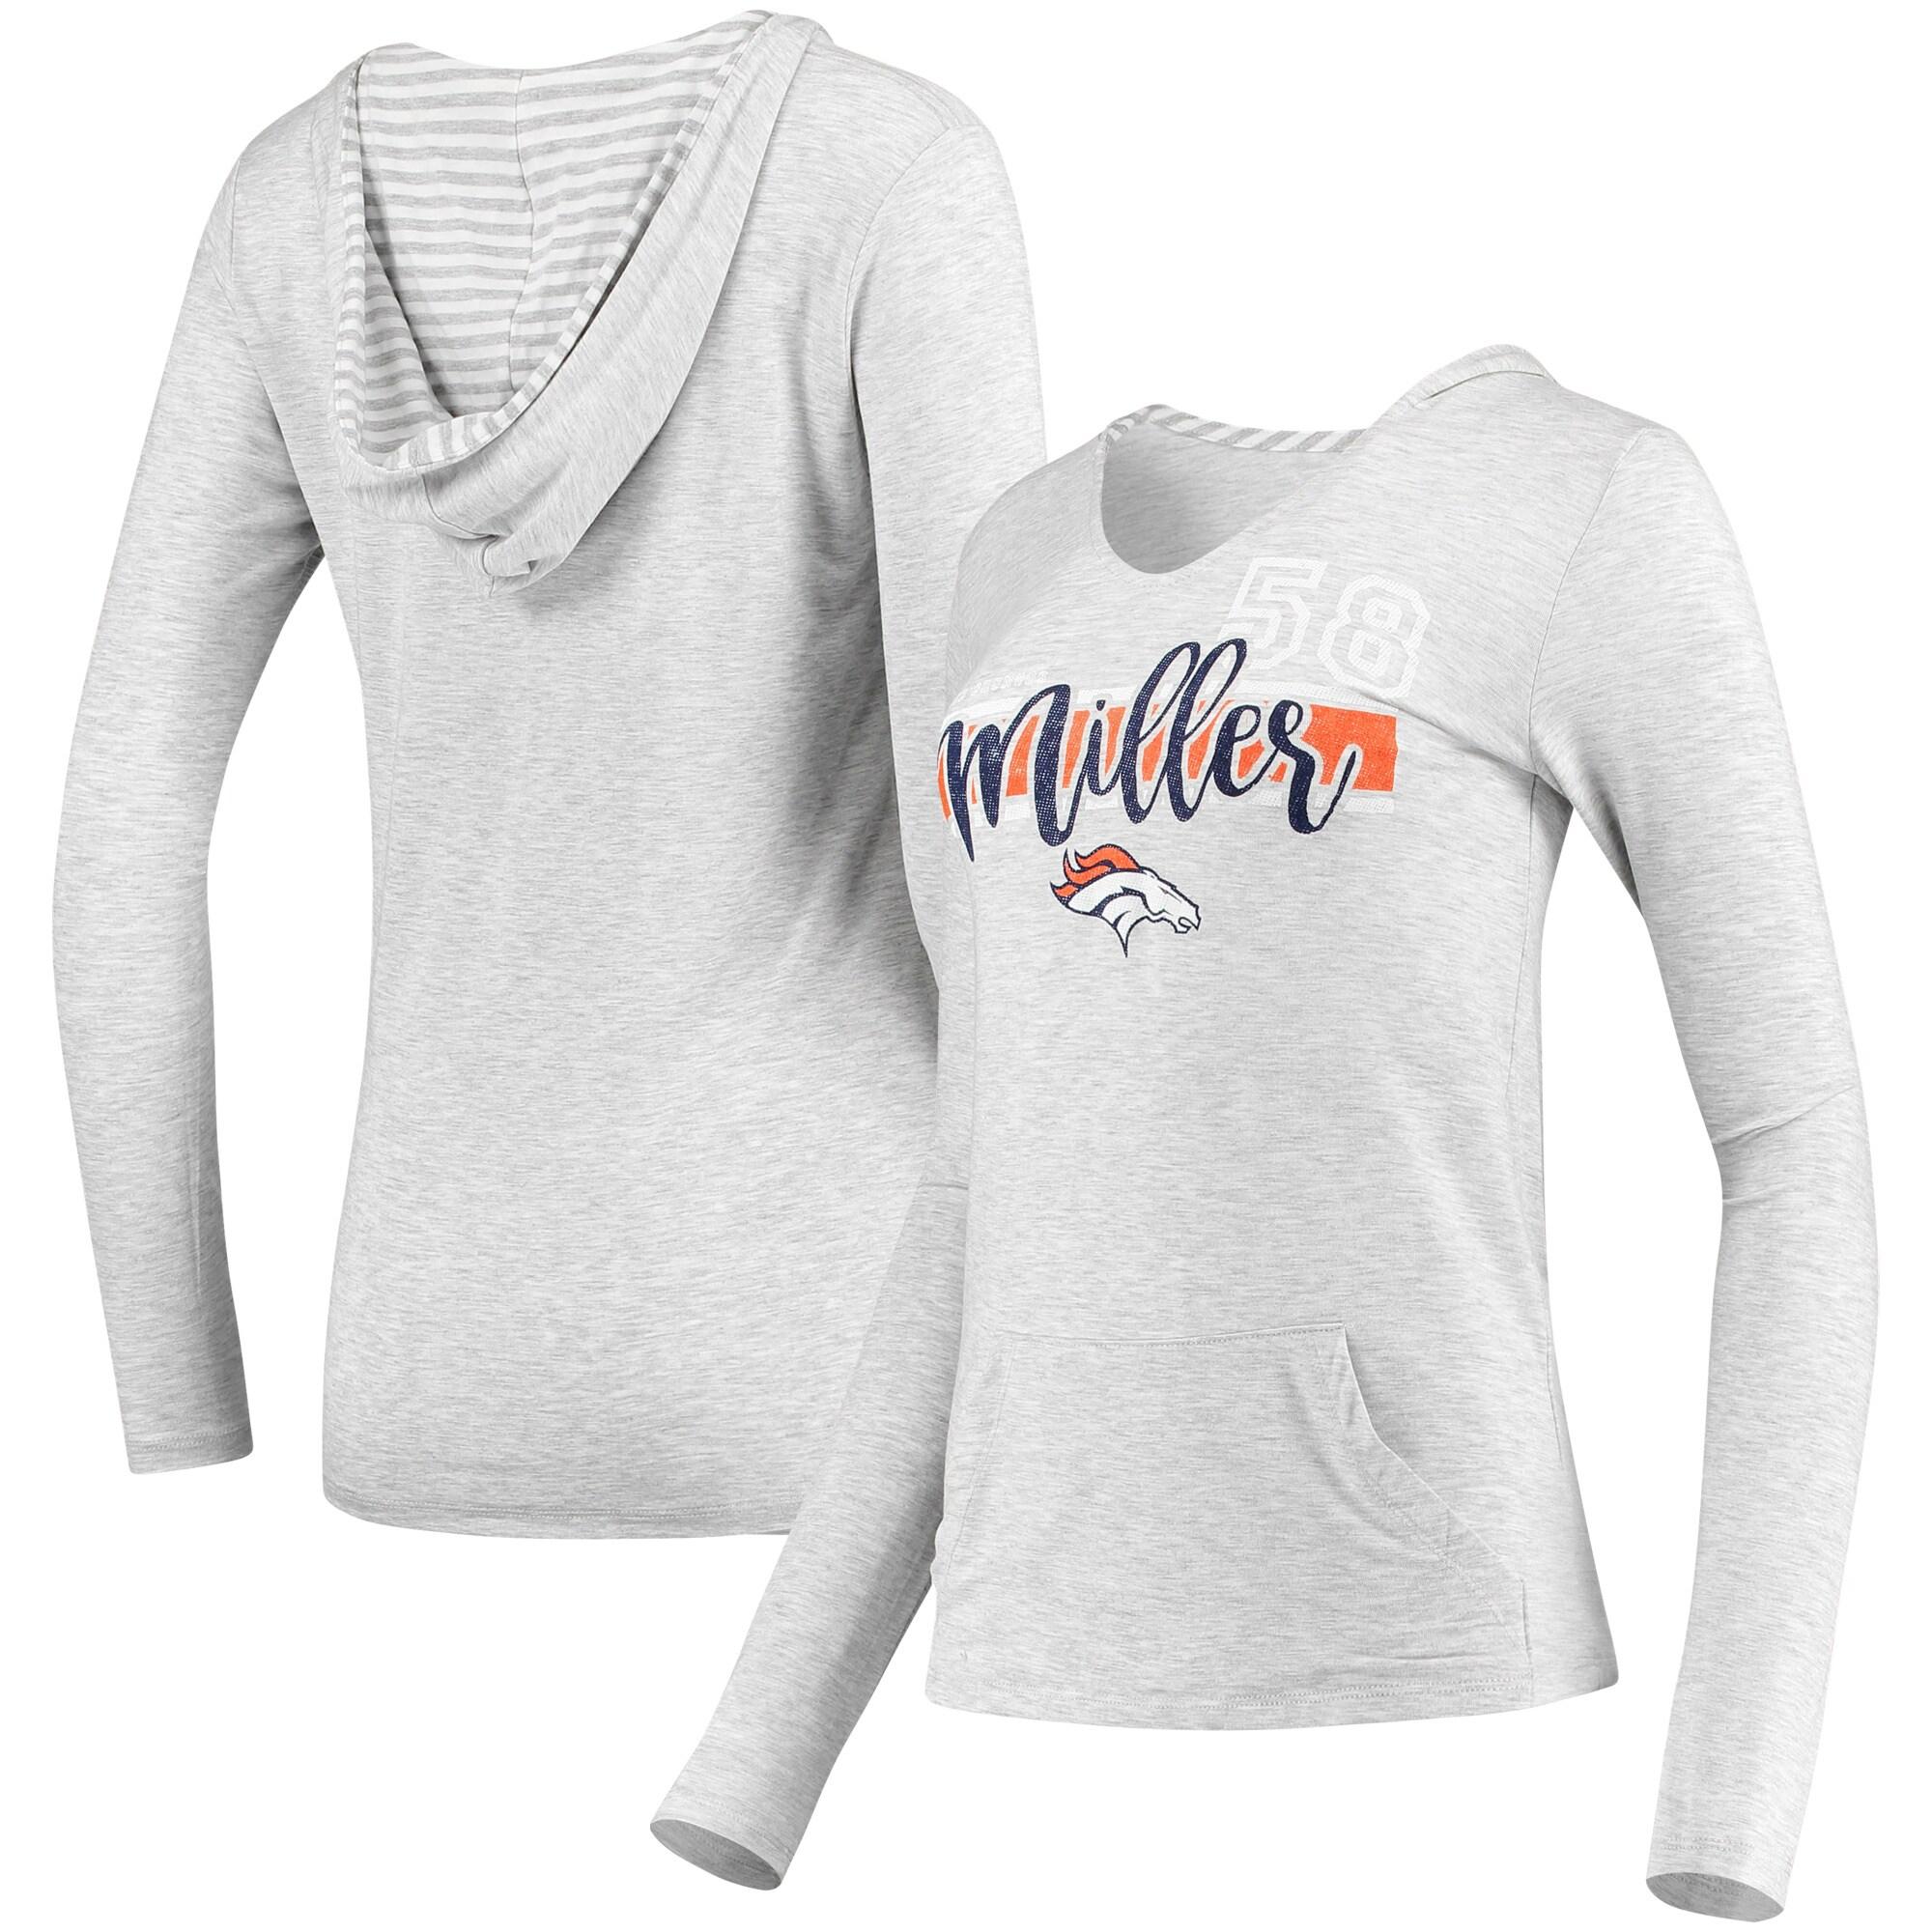 Von Miller Denver Broncos Women's Pocket Name & Number Hoodie T-Shirt - Gray